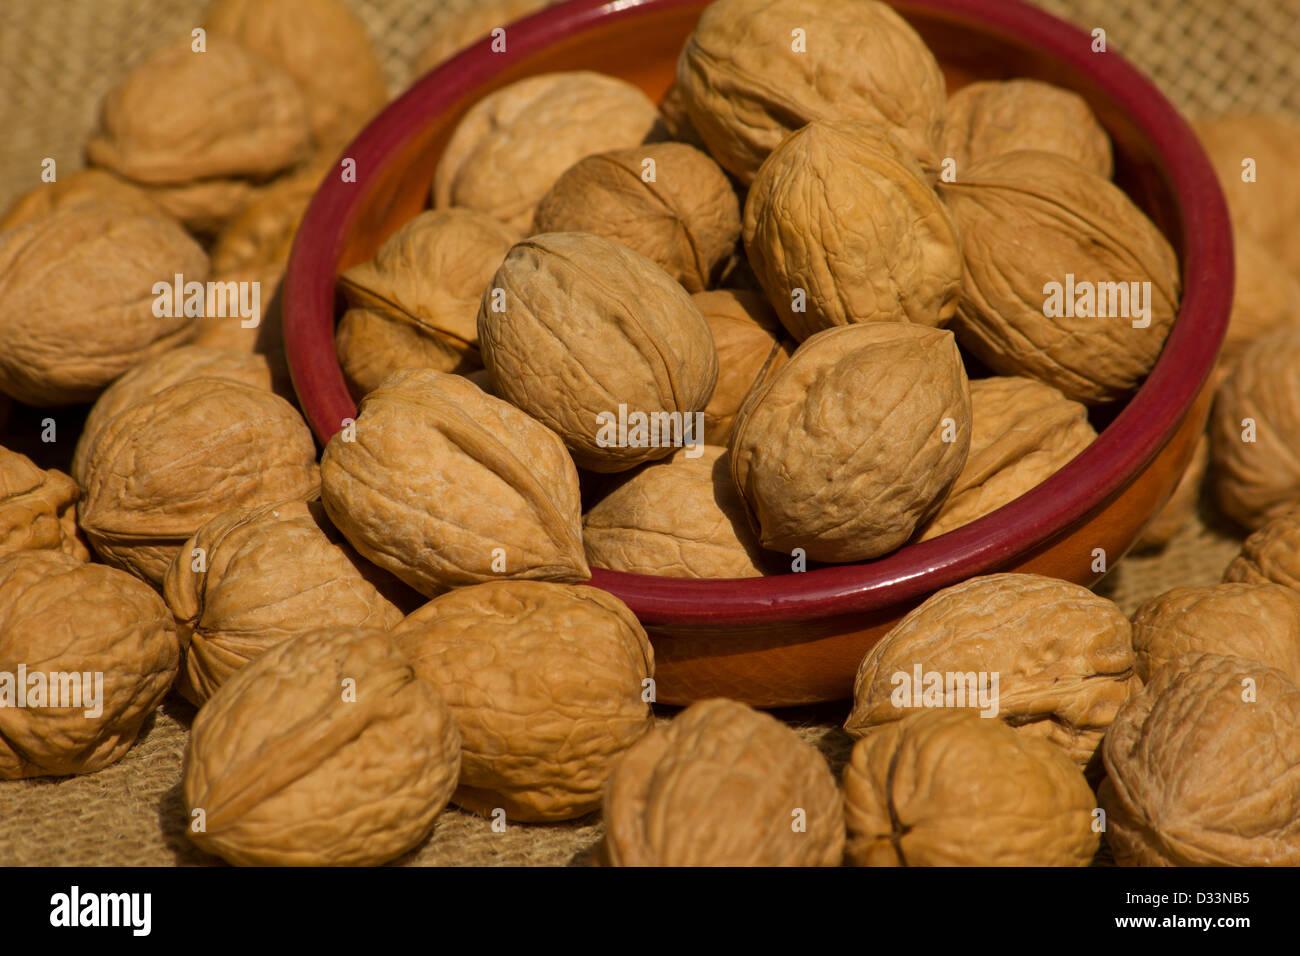 Walnuts in a ceramic bowl on burlap Stock Photo